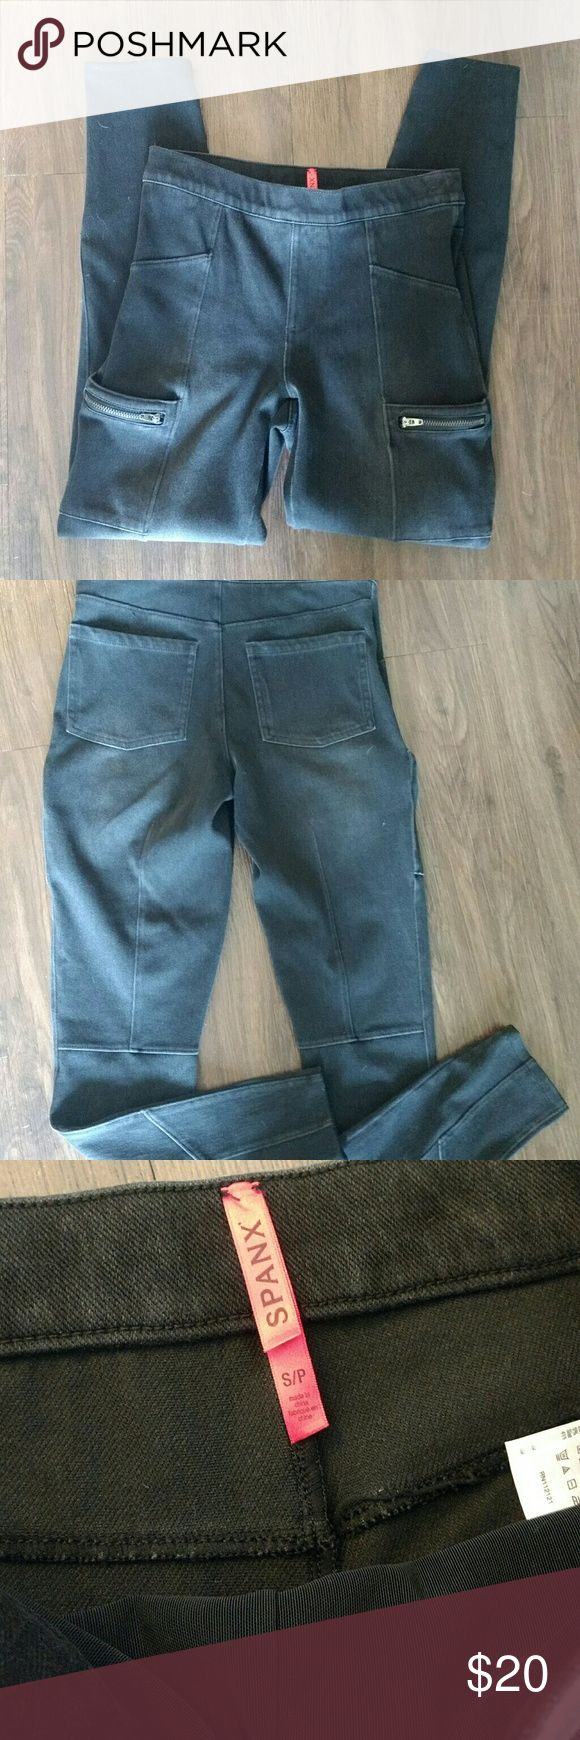 Black SPANX Jeans Size small SPANX jeans SPANX Pants